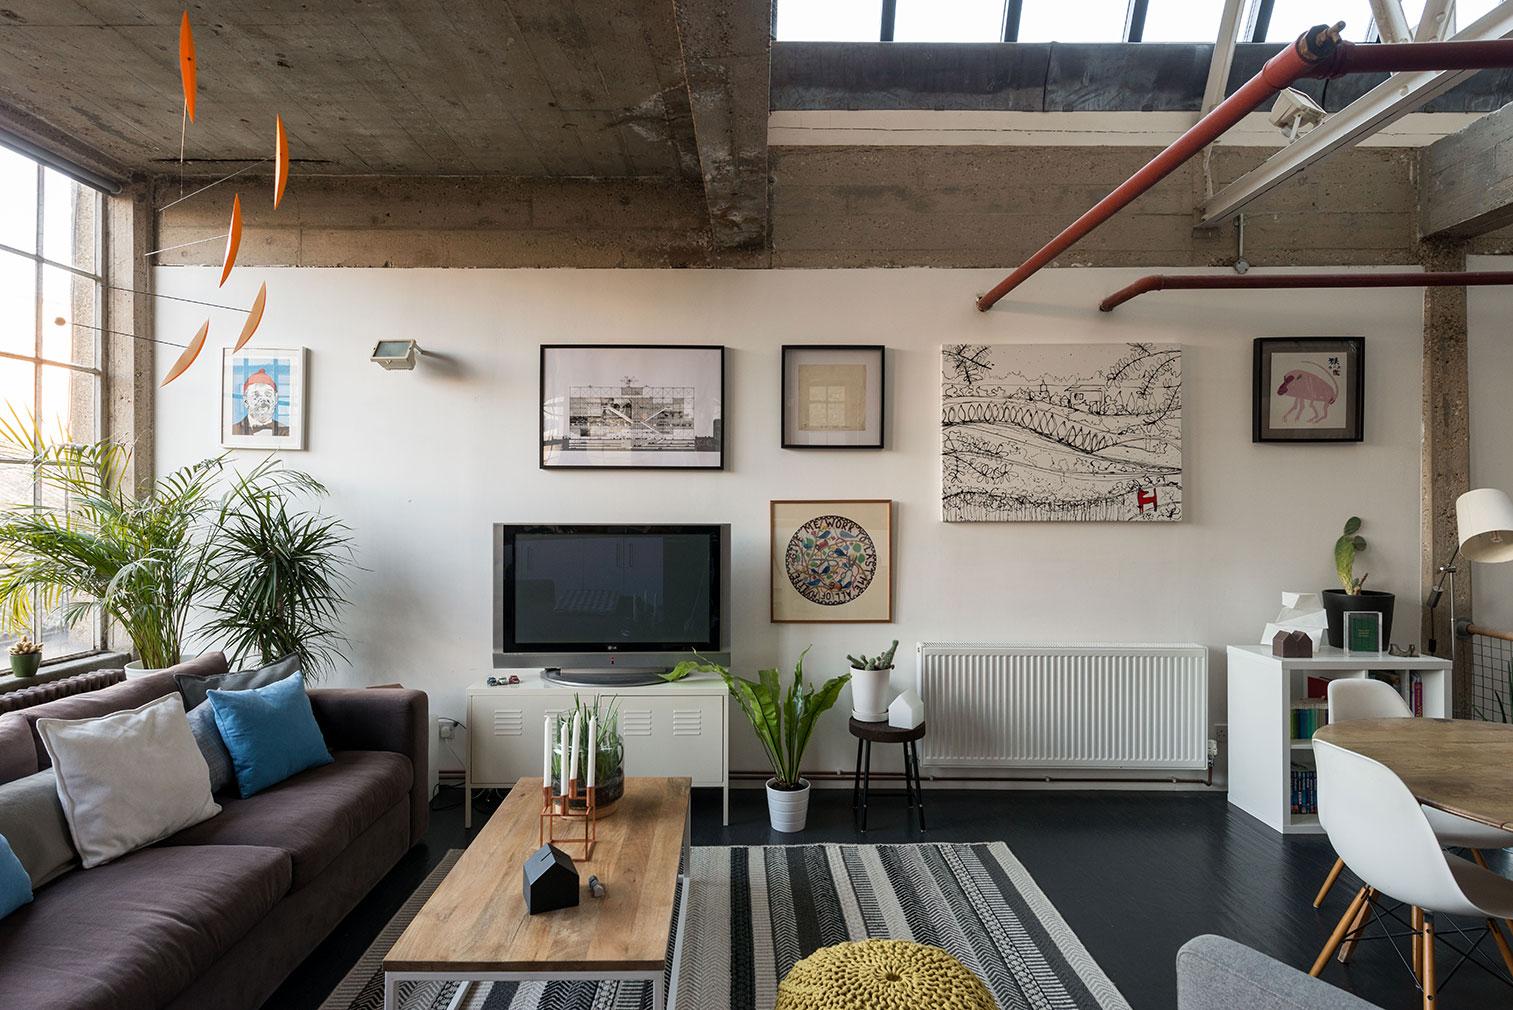 London warehouse conversion for sale